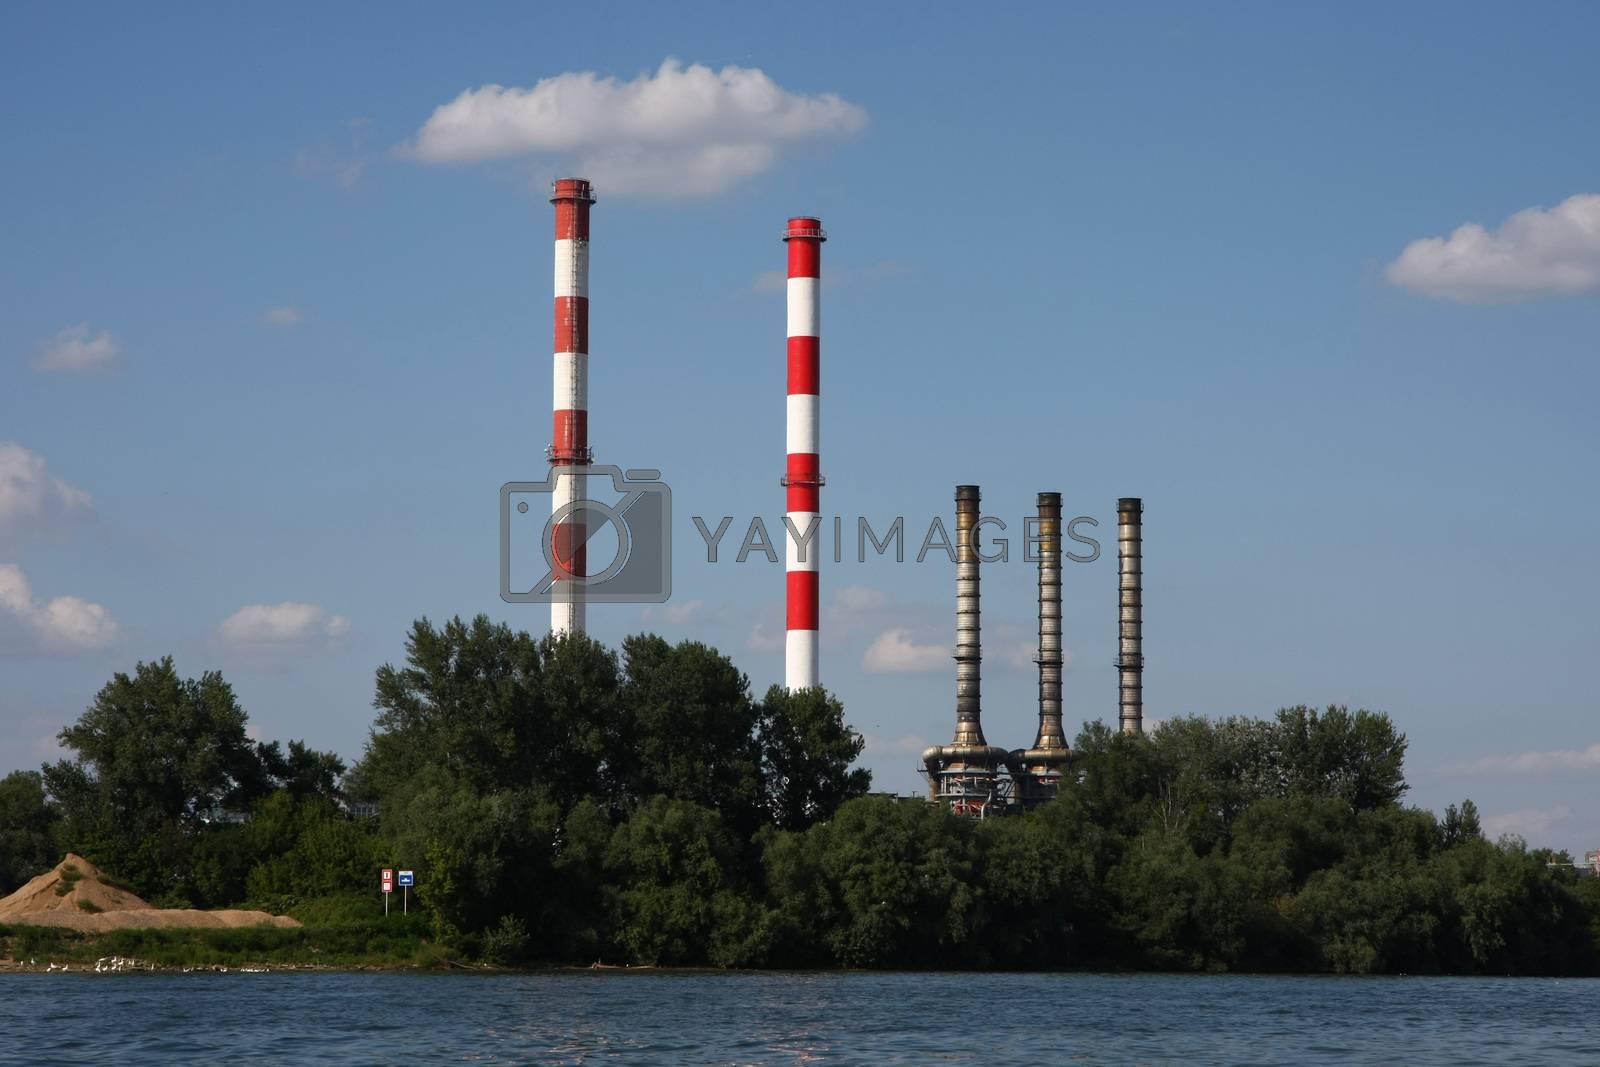 Chimneys of heating plant on the coast of Sava river,Belgrade,Serbia